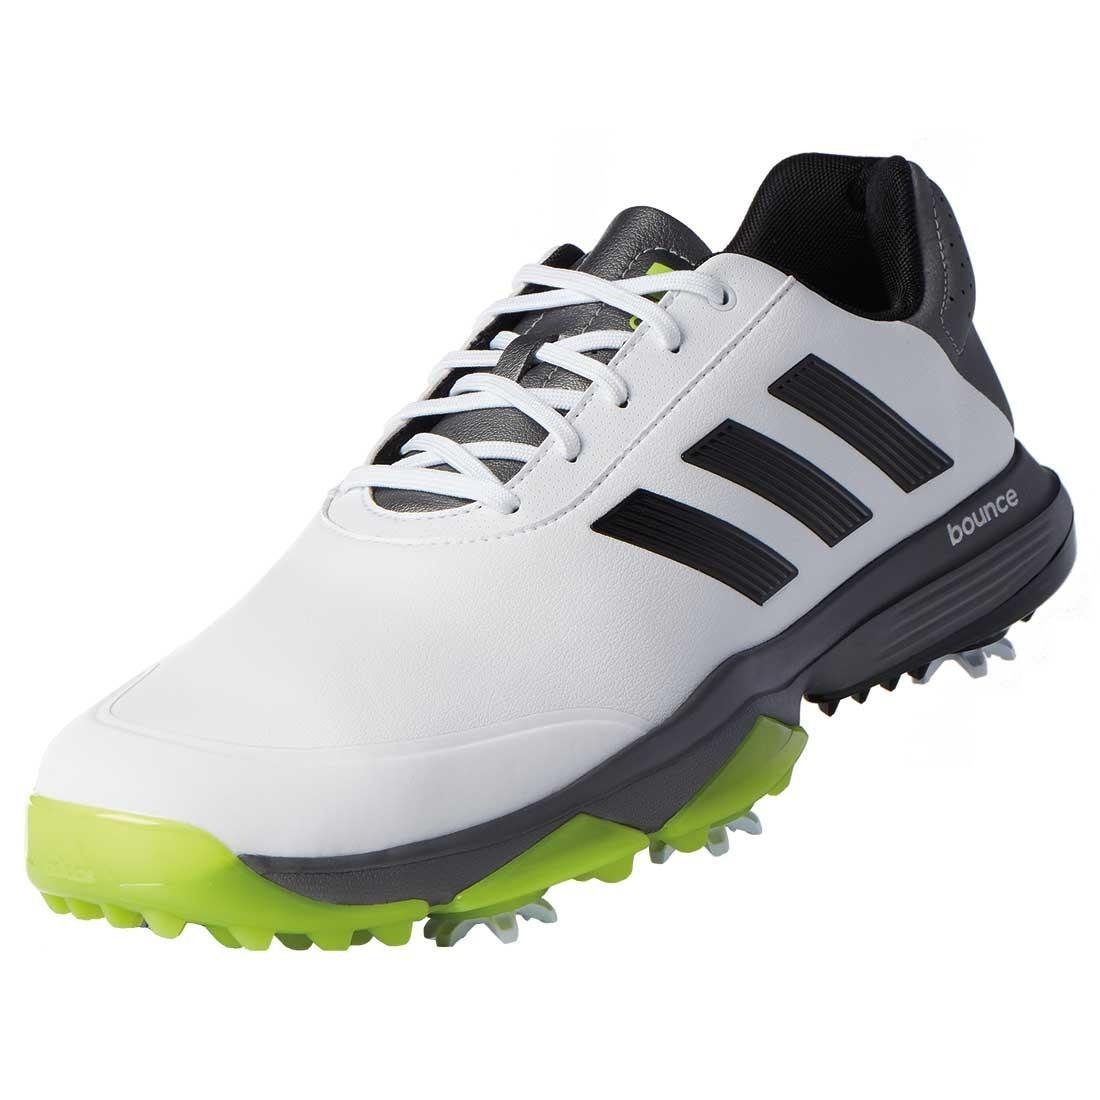 ac13aa74b02 Sapato adidas Adipower Bounce Branco preto - 8 (usa) - R  620